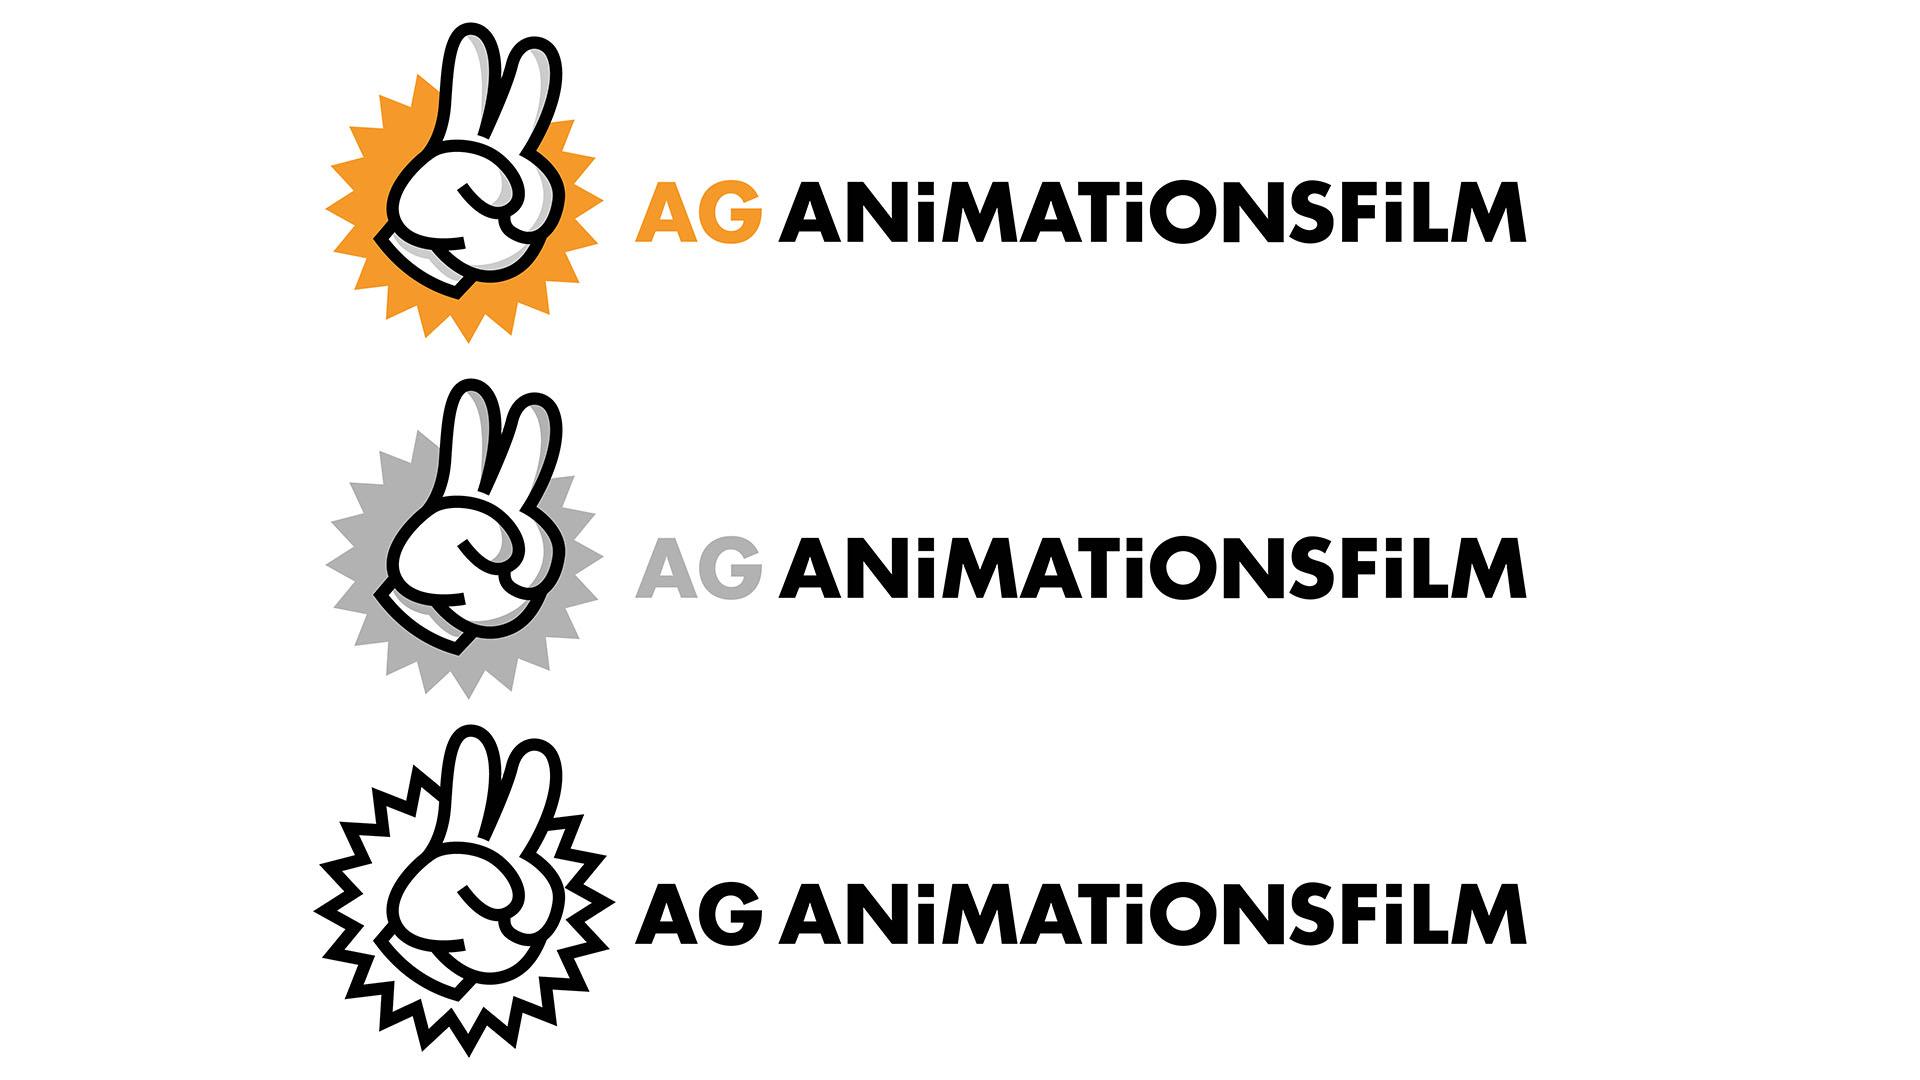 AG_Animationsfilm_Slideshow_02